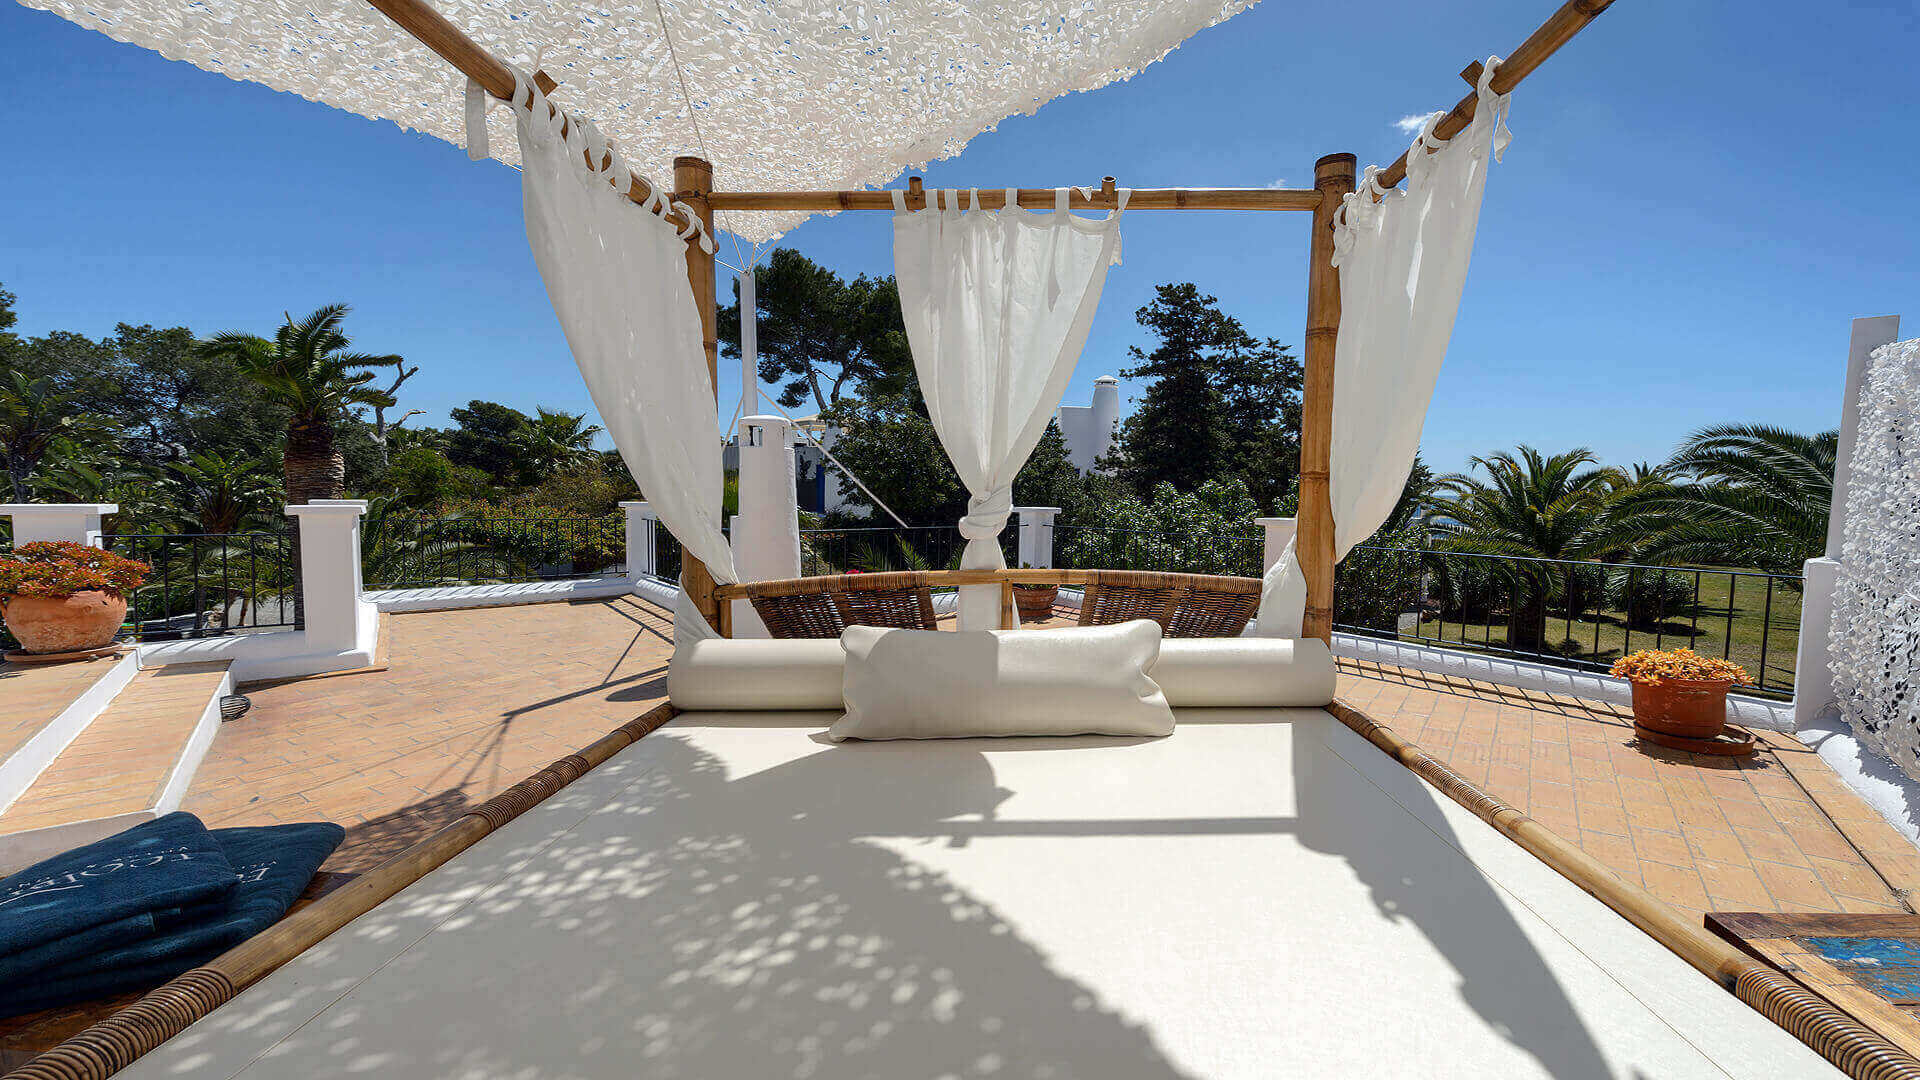 Villa Cigala Ibiza 24 Bungalow Terrace